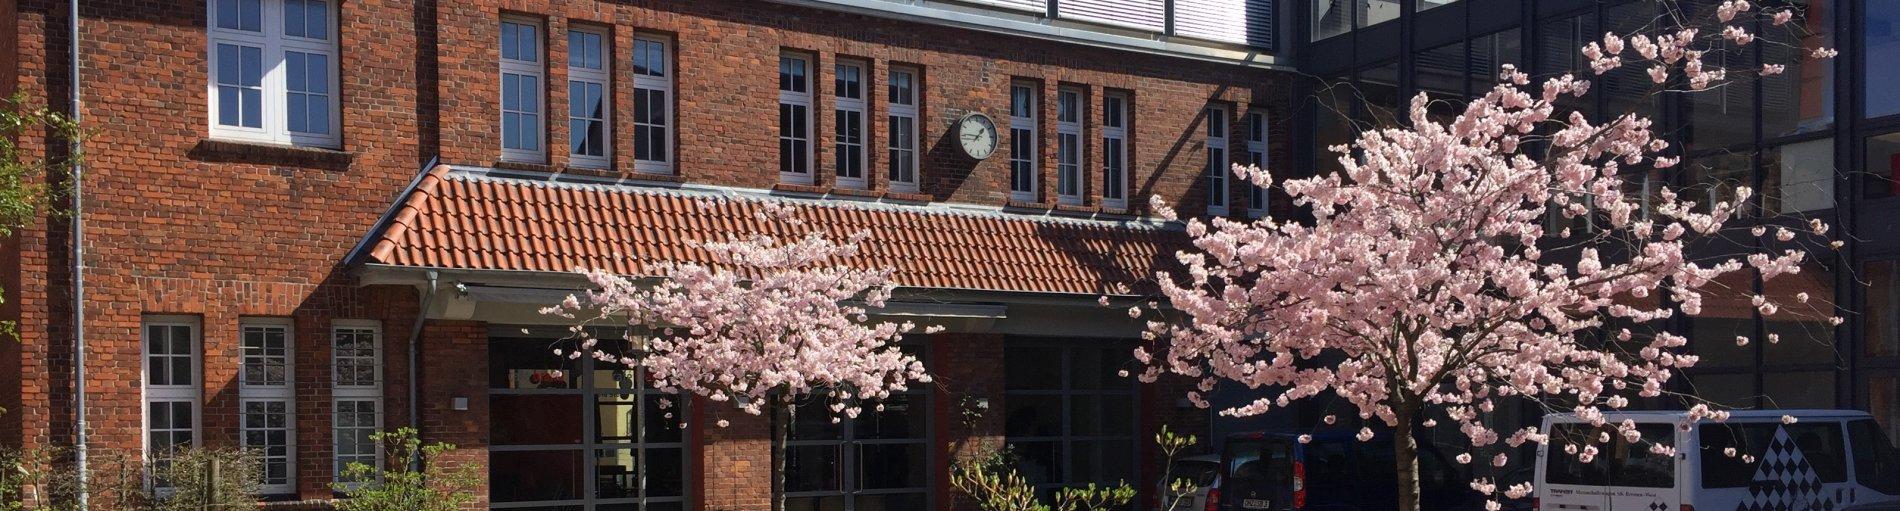 Außenansicht des Atelierhauses Roter Hahn (Quelle: Kultur vor Ort e.V.).